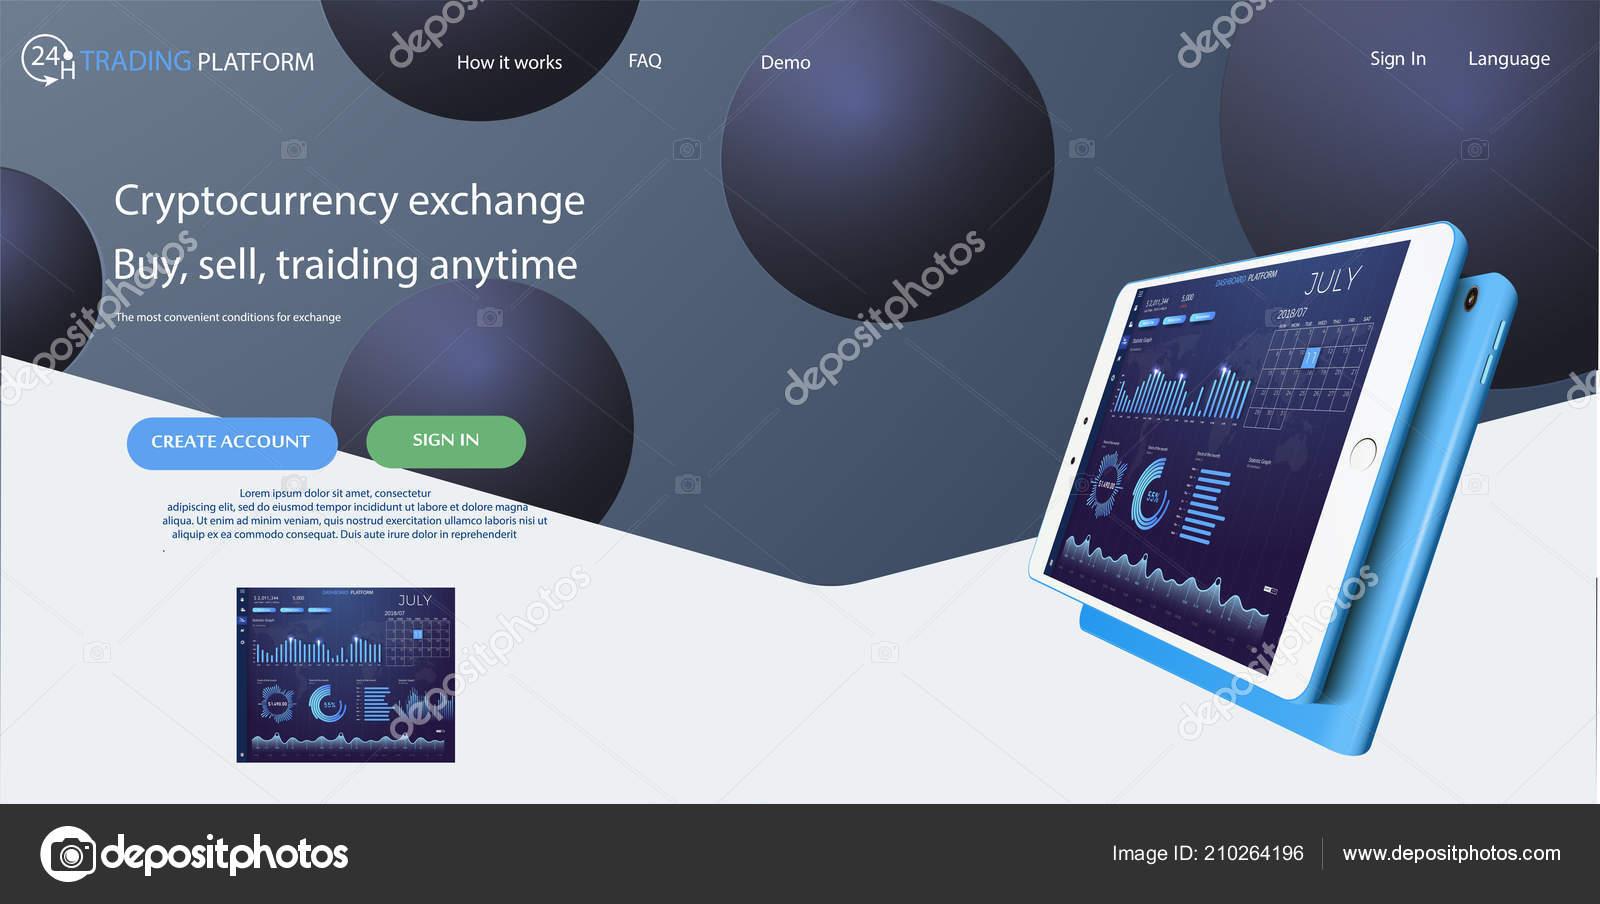 Сайт форекс фор программа обучающая игре на бирже